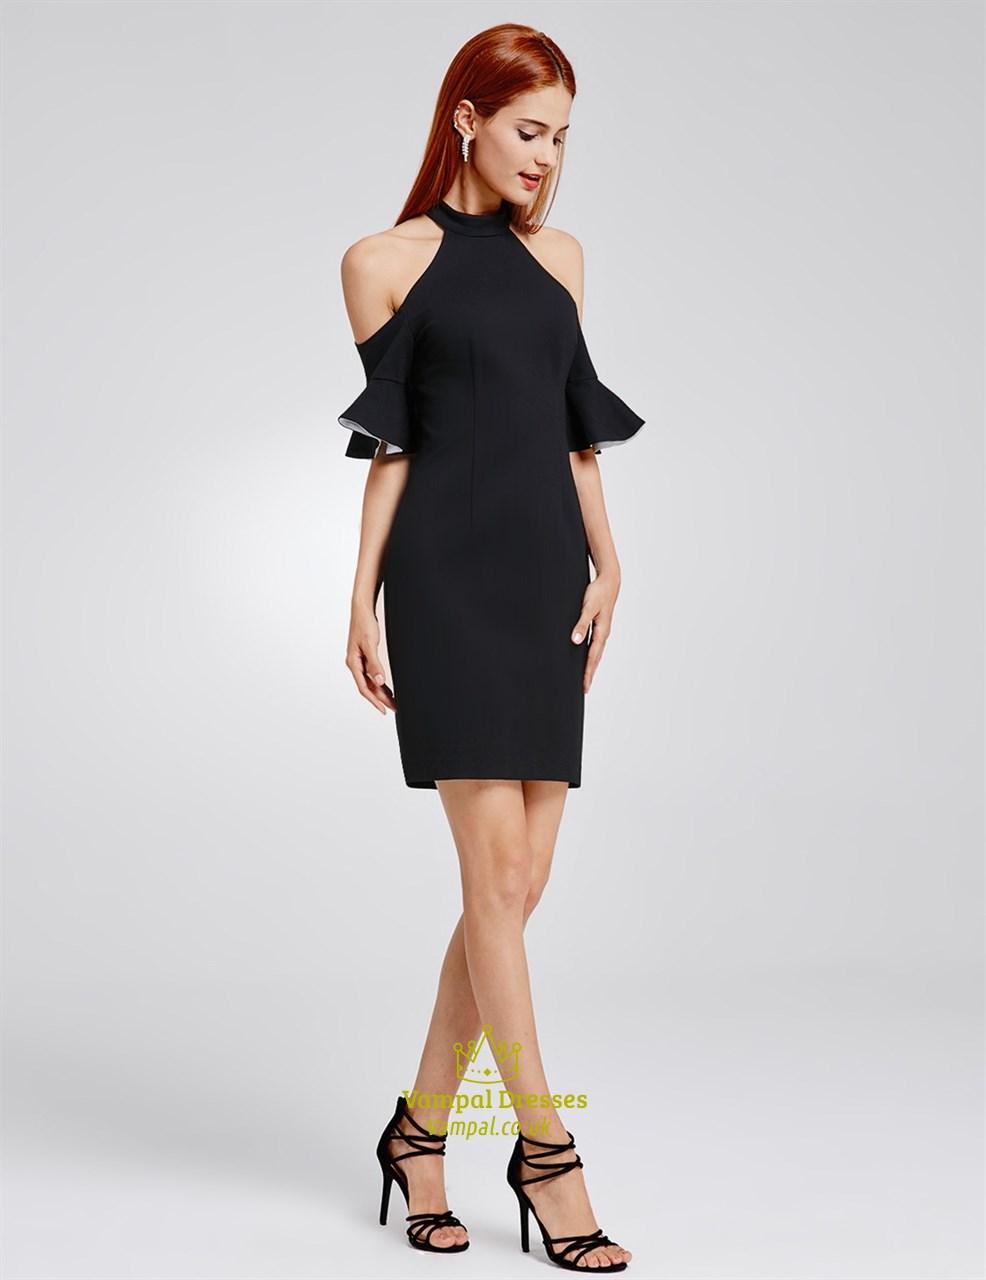 simple elegant black knee length bodycon cocktail dress